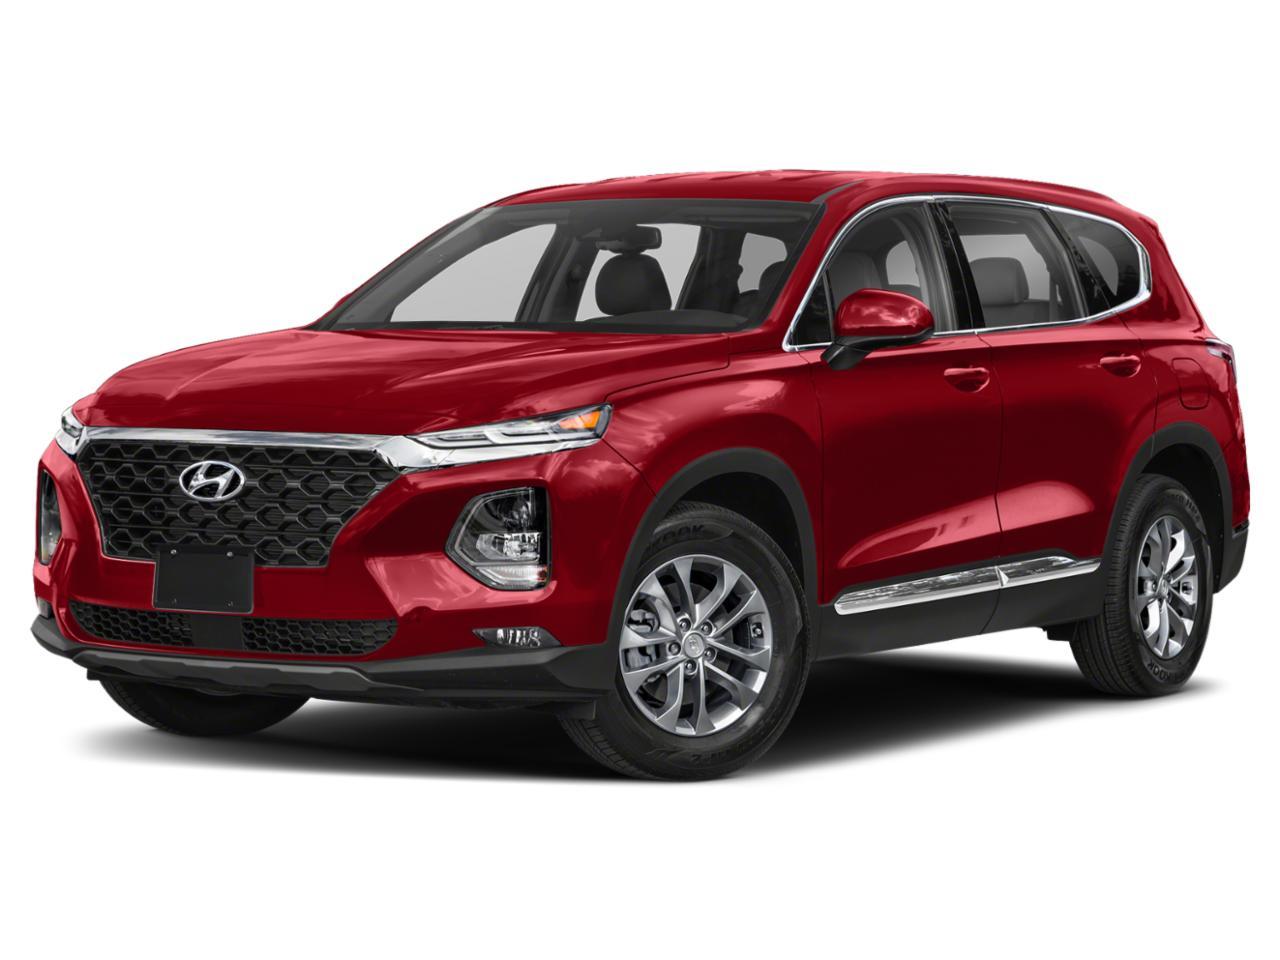 2020 Hyundai Santa Fe Vehicle Photo in Colma, CA 94014